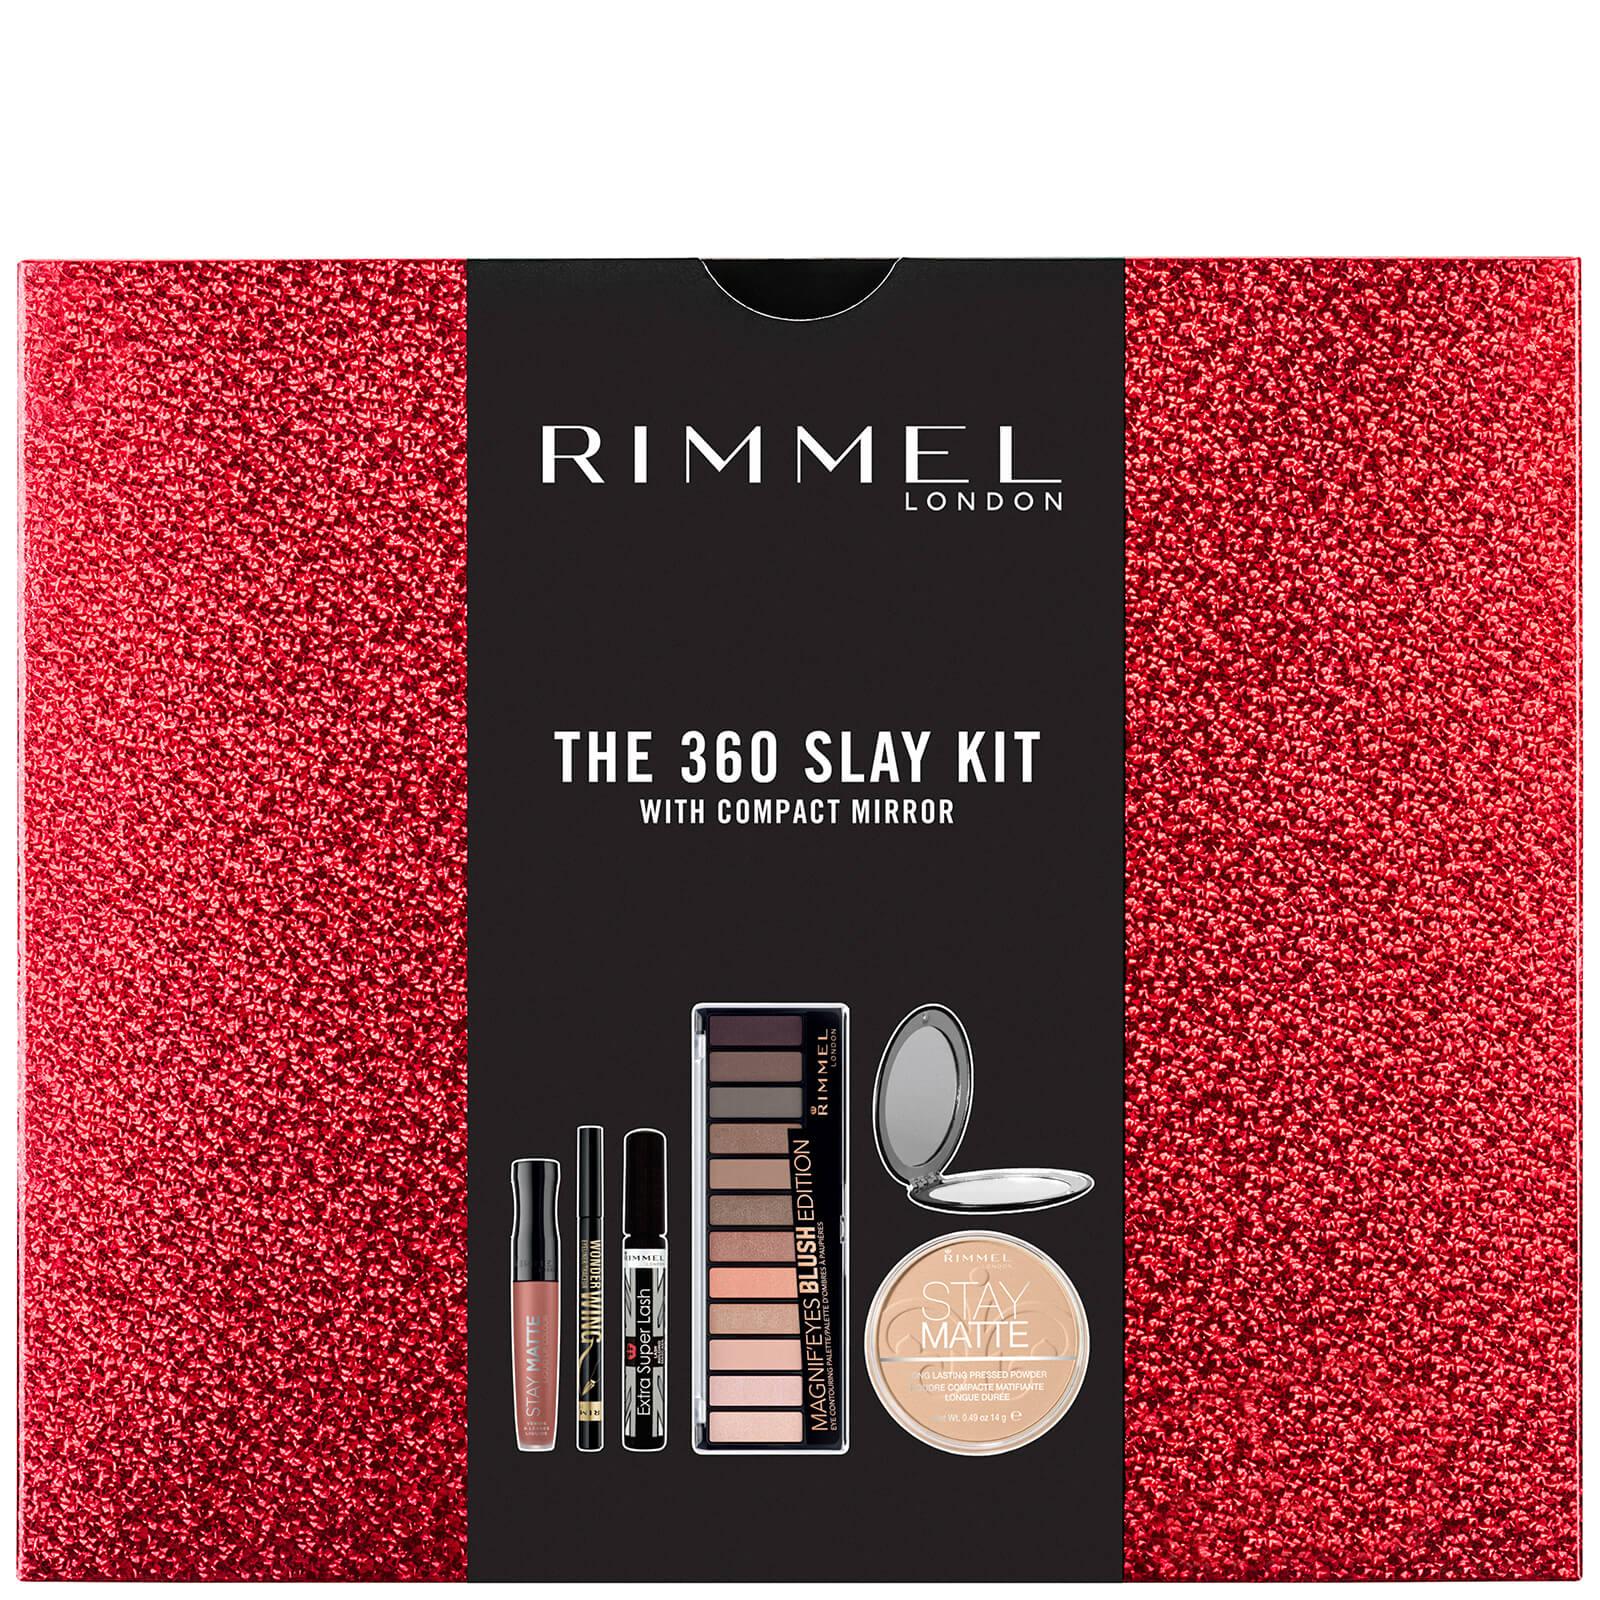 bbf184925fc Rimmel 360 Slay Kit Gift Set - Stay Matte Powder, Stay Matte LL ...